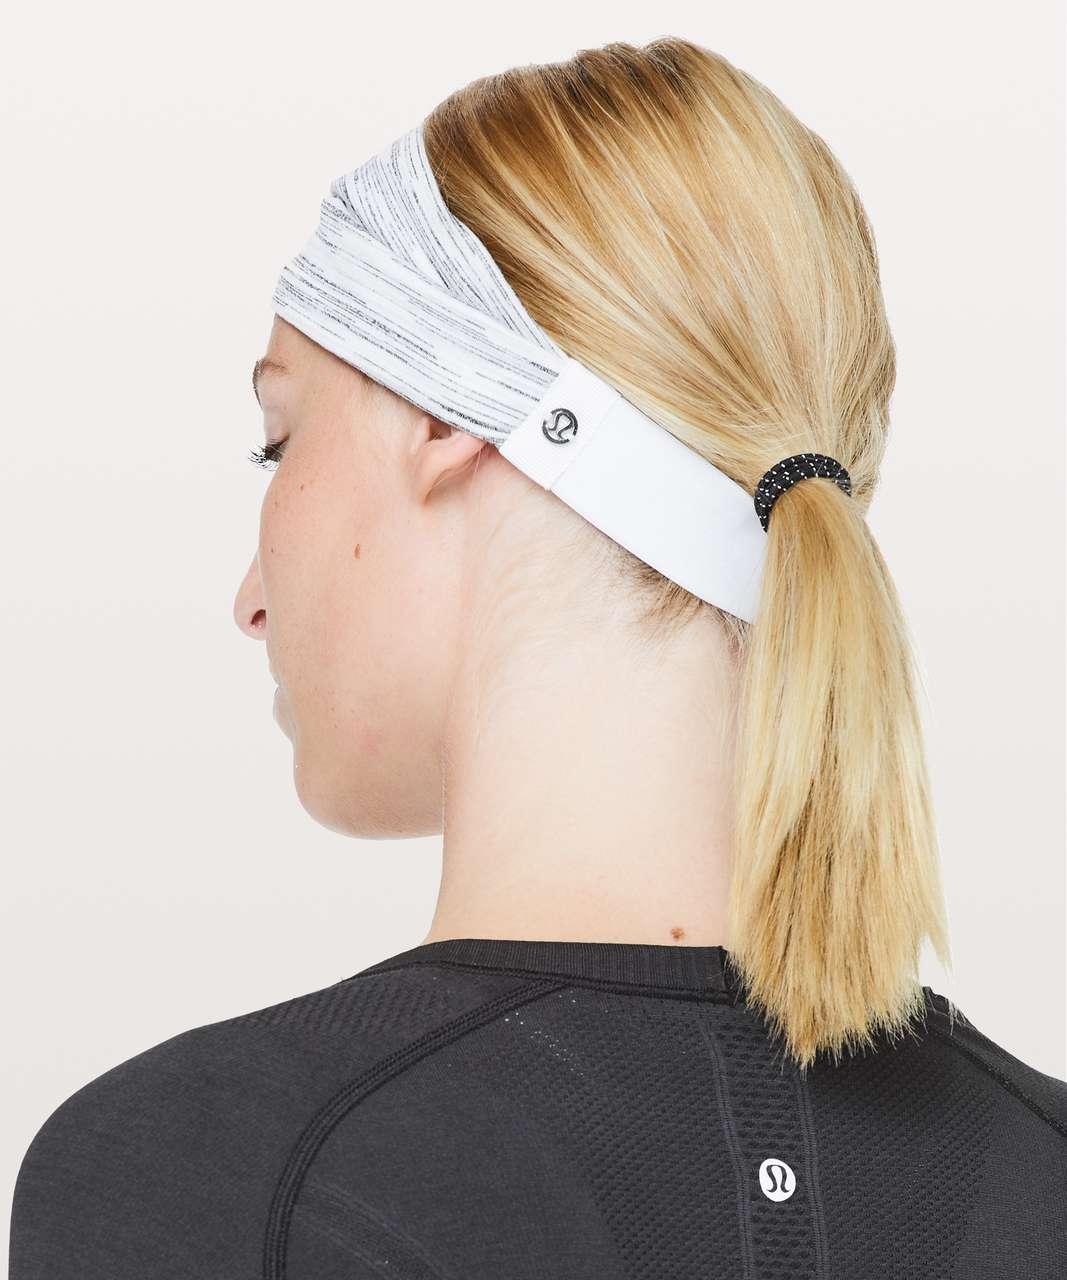 Lululemon Fringe Fighter Headband - Wildwood White Multi / Space Dye Camo White Silver Spoon